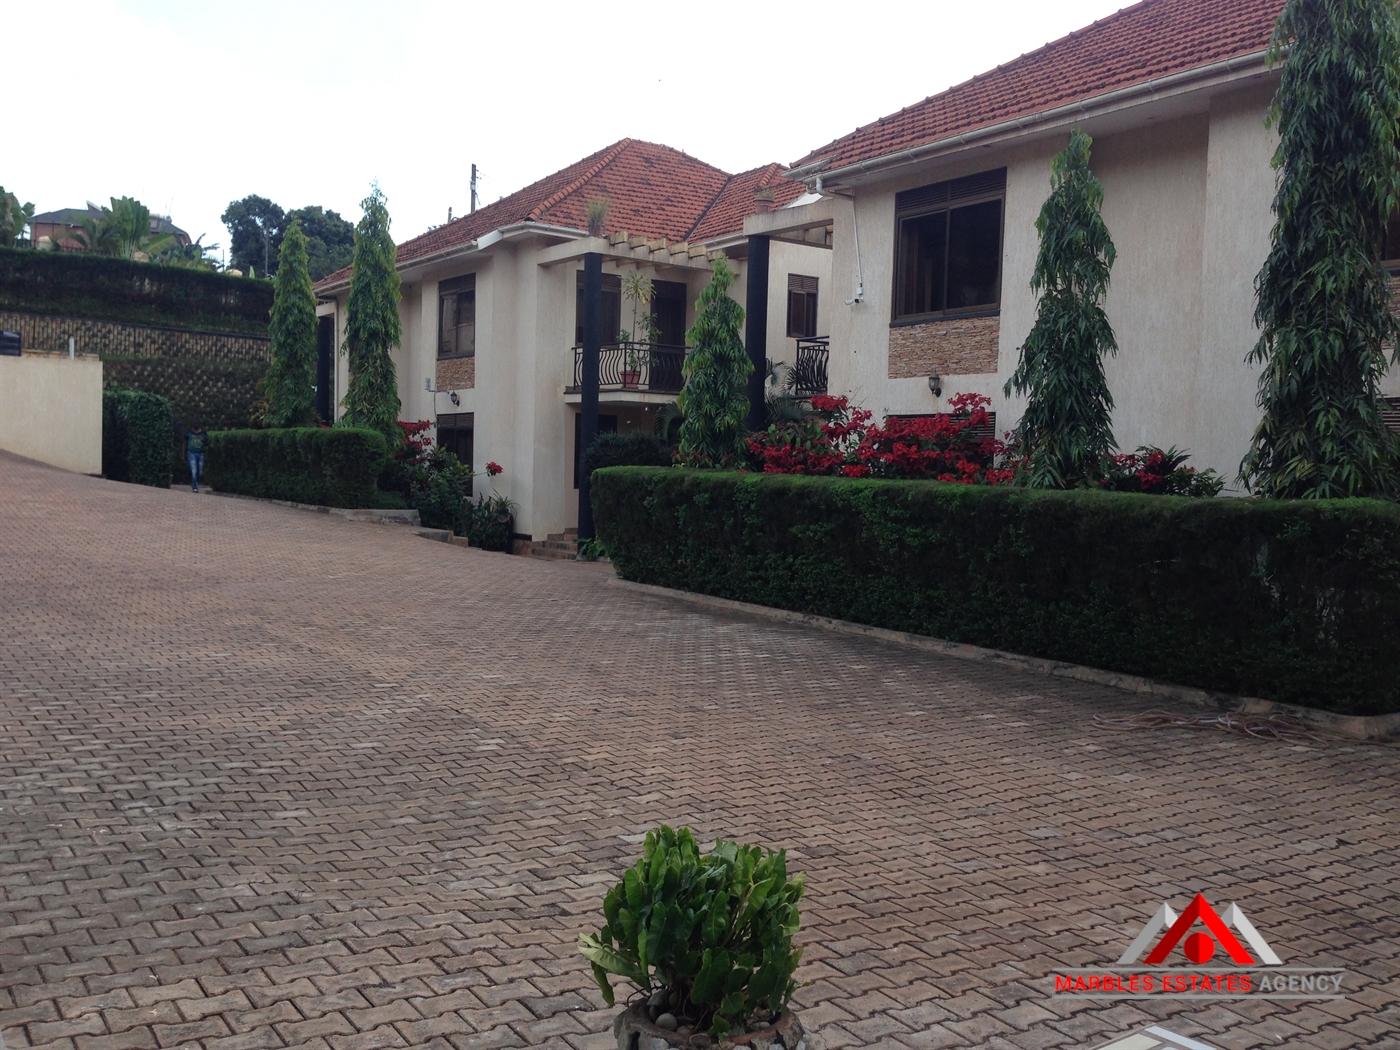 Town House for rent in Naguru Kampala